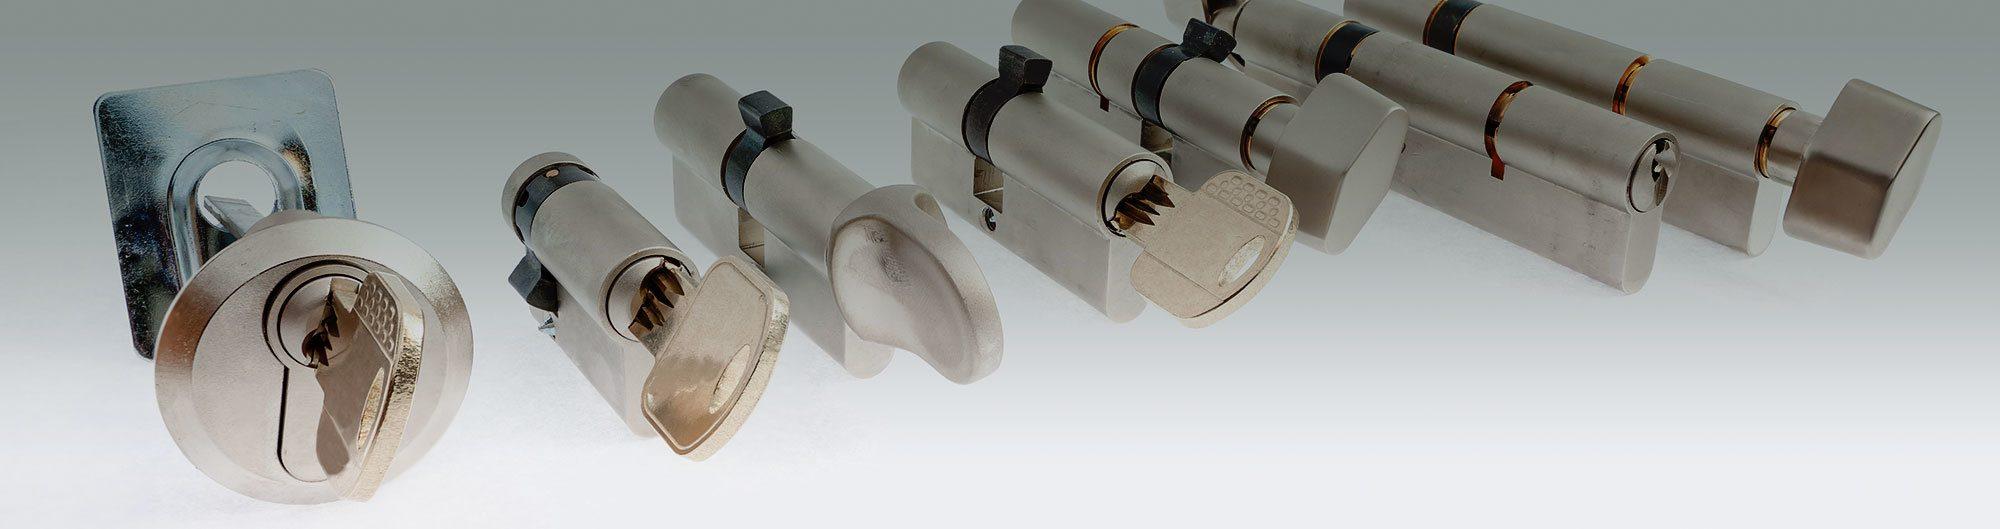 slotenservice slothulp slotenmaker nieuwegein ervaren slotenmaker sleutelspecialist goedkoop slotenmaker